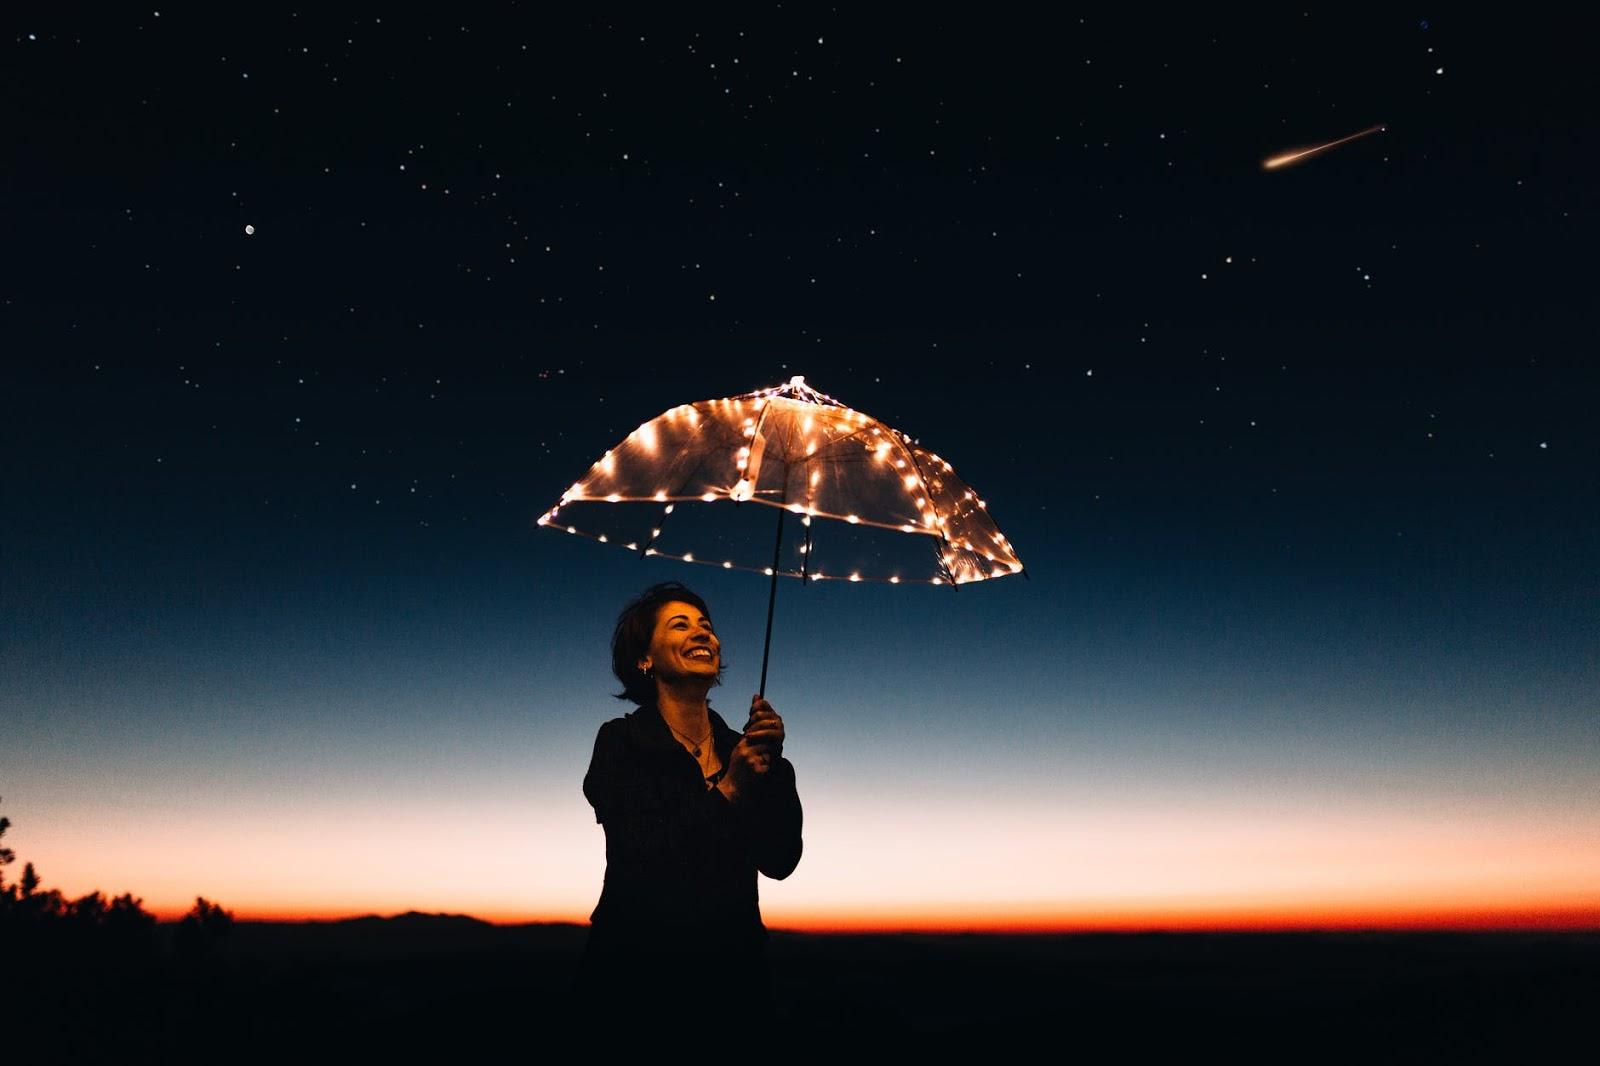 A woman, smiling, holding an illuminated umbrella at dusk